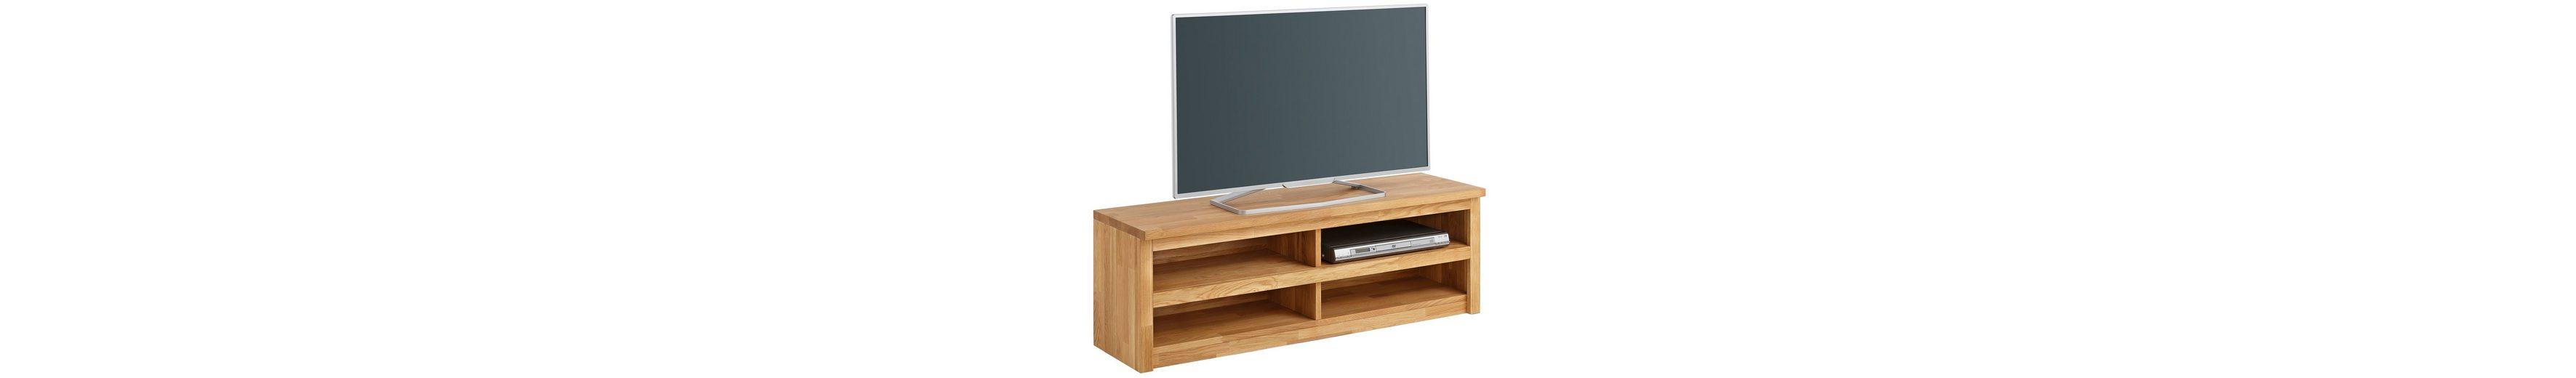 Home affaire Lowboard »Una«, Breite 120 cm